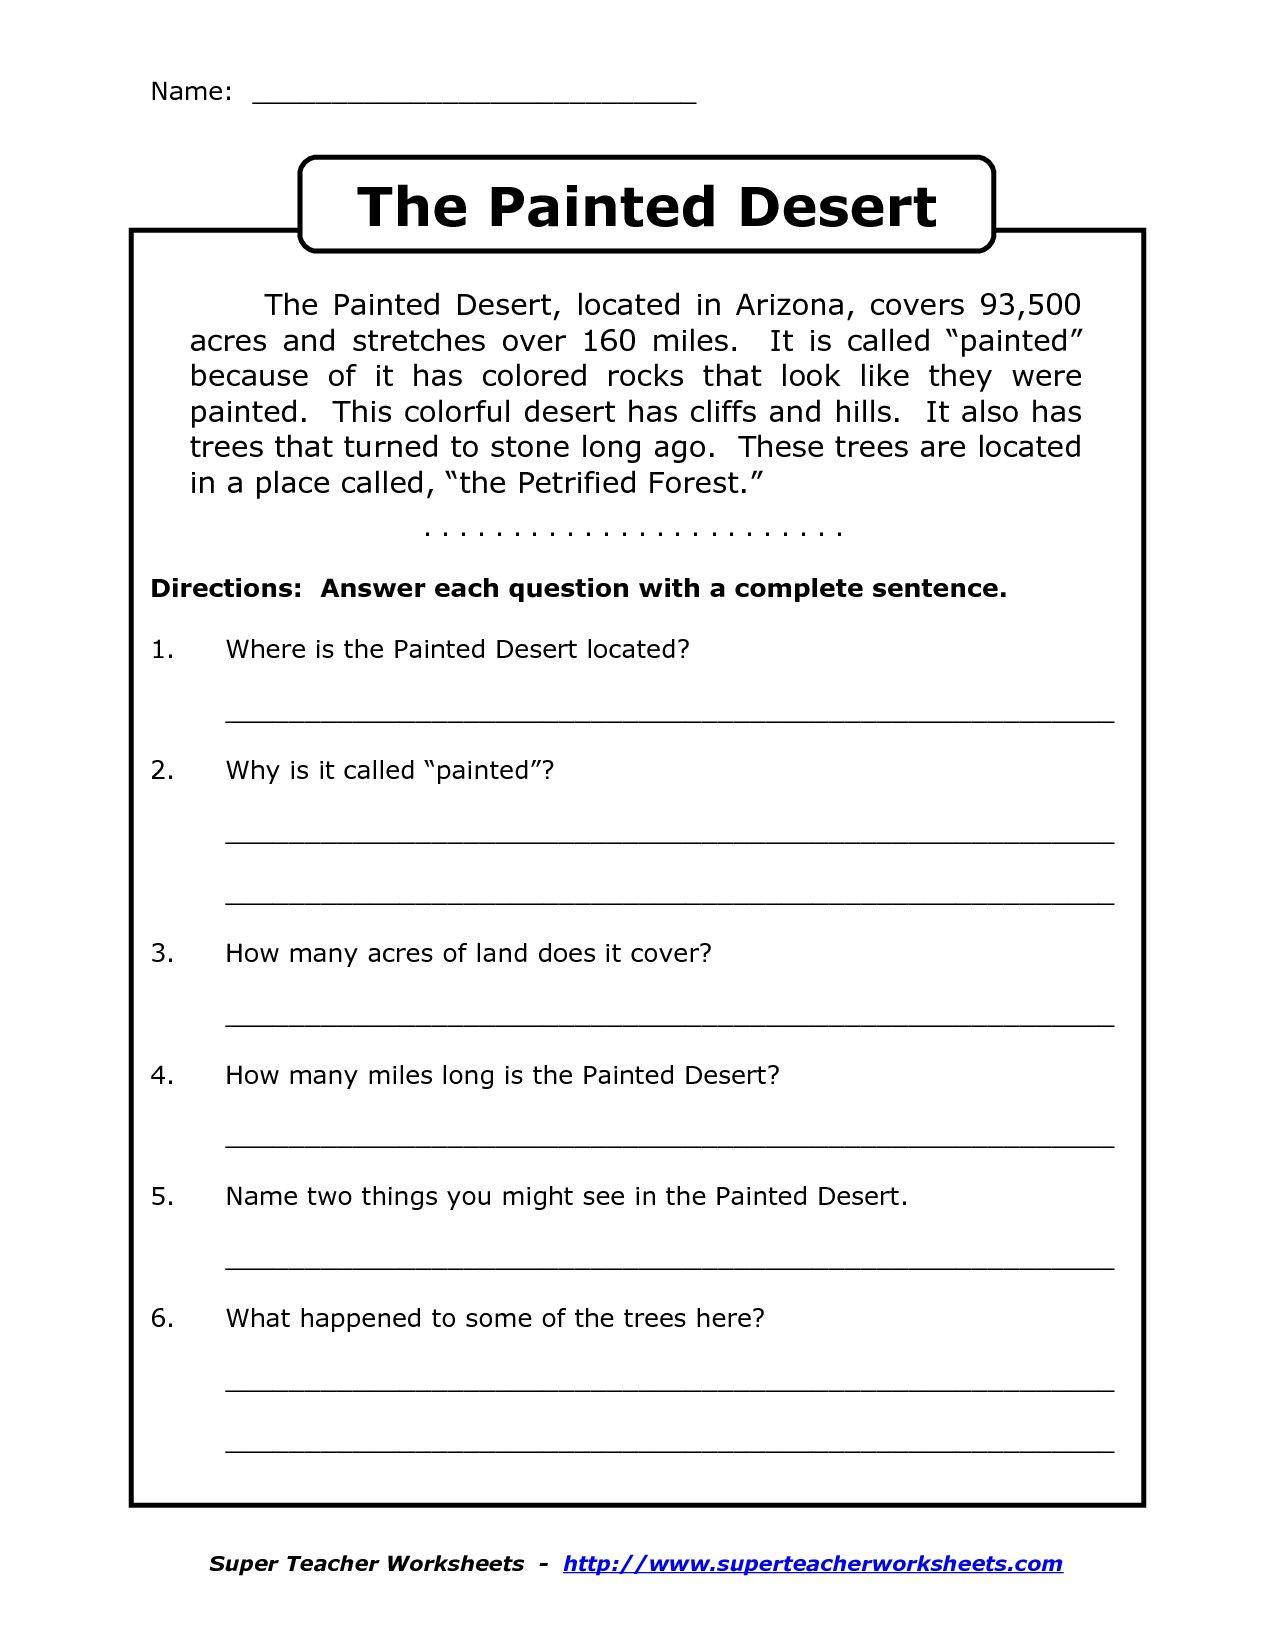 Image Result For Free Printable Worksheets For Grade 4 Comprehension - Free Printable English Comprehension Worksheets For Grade 4